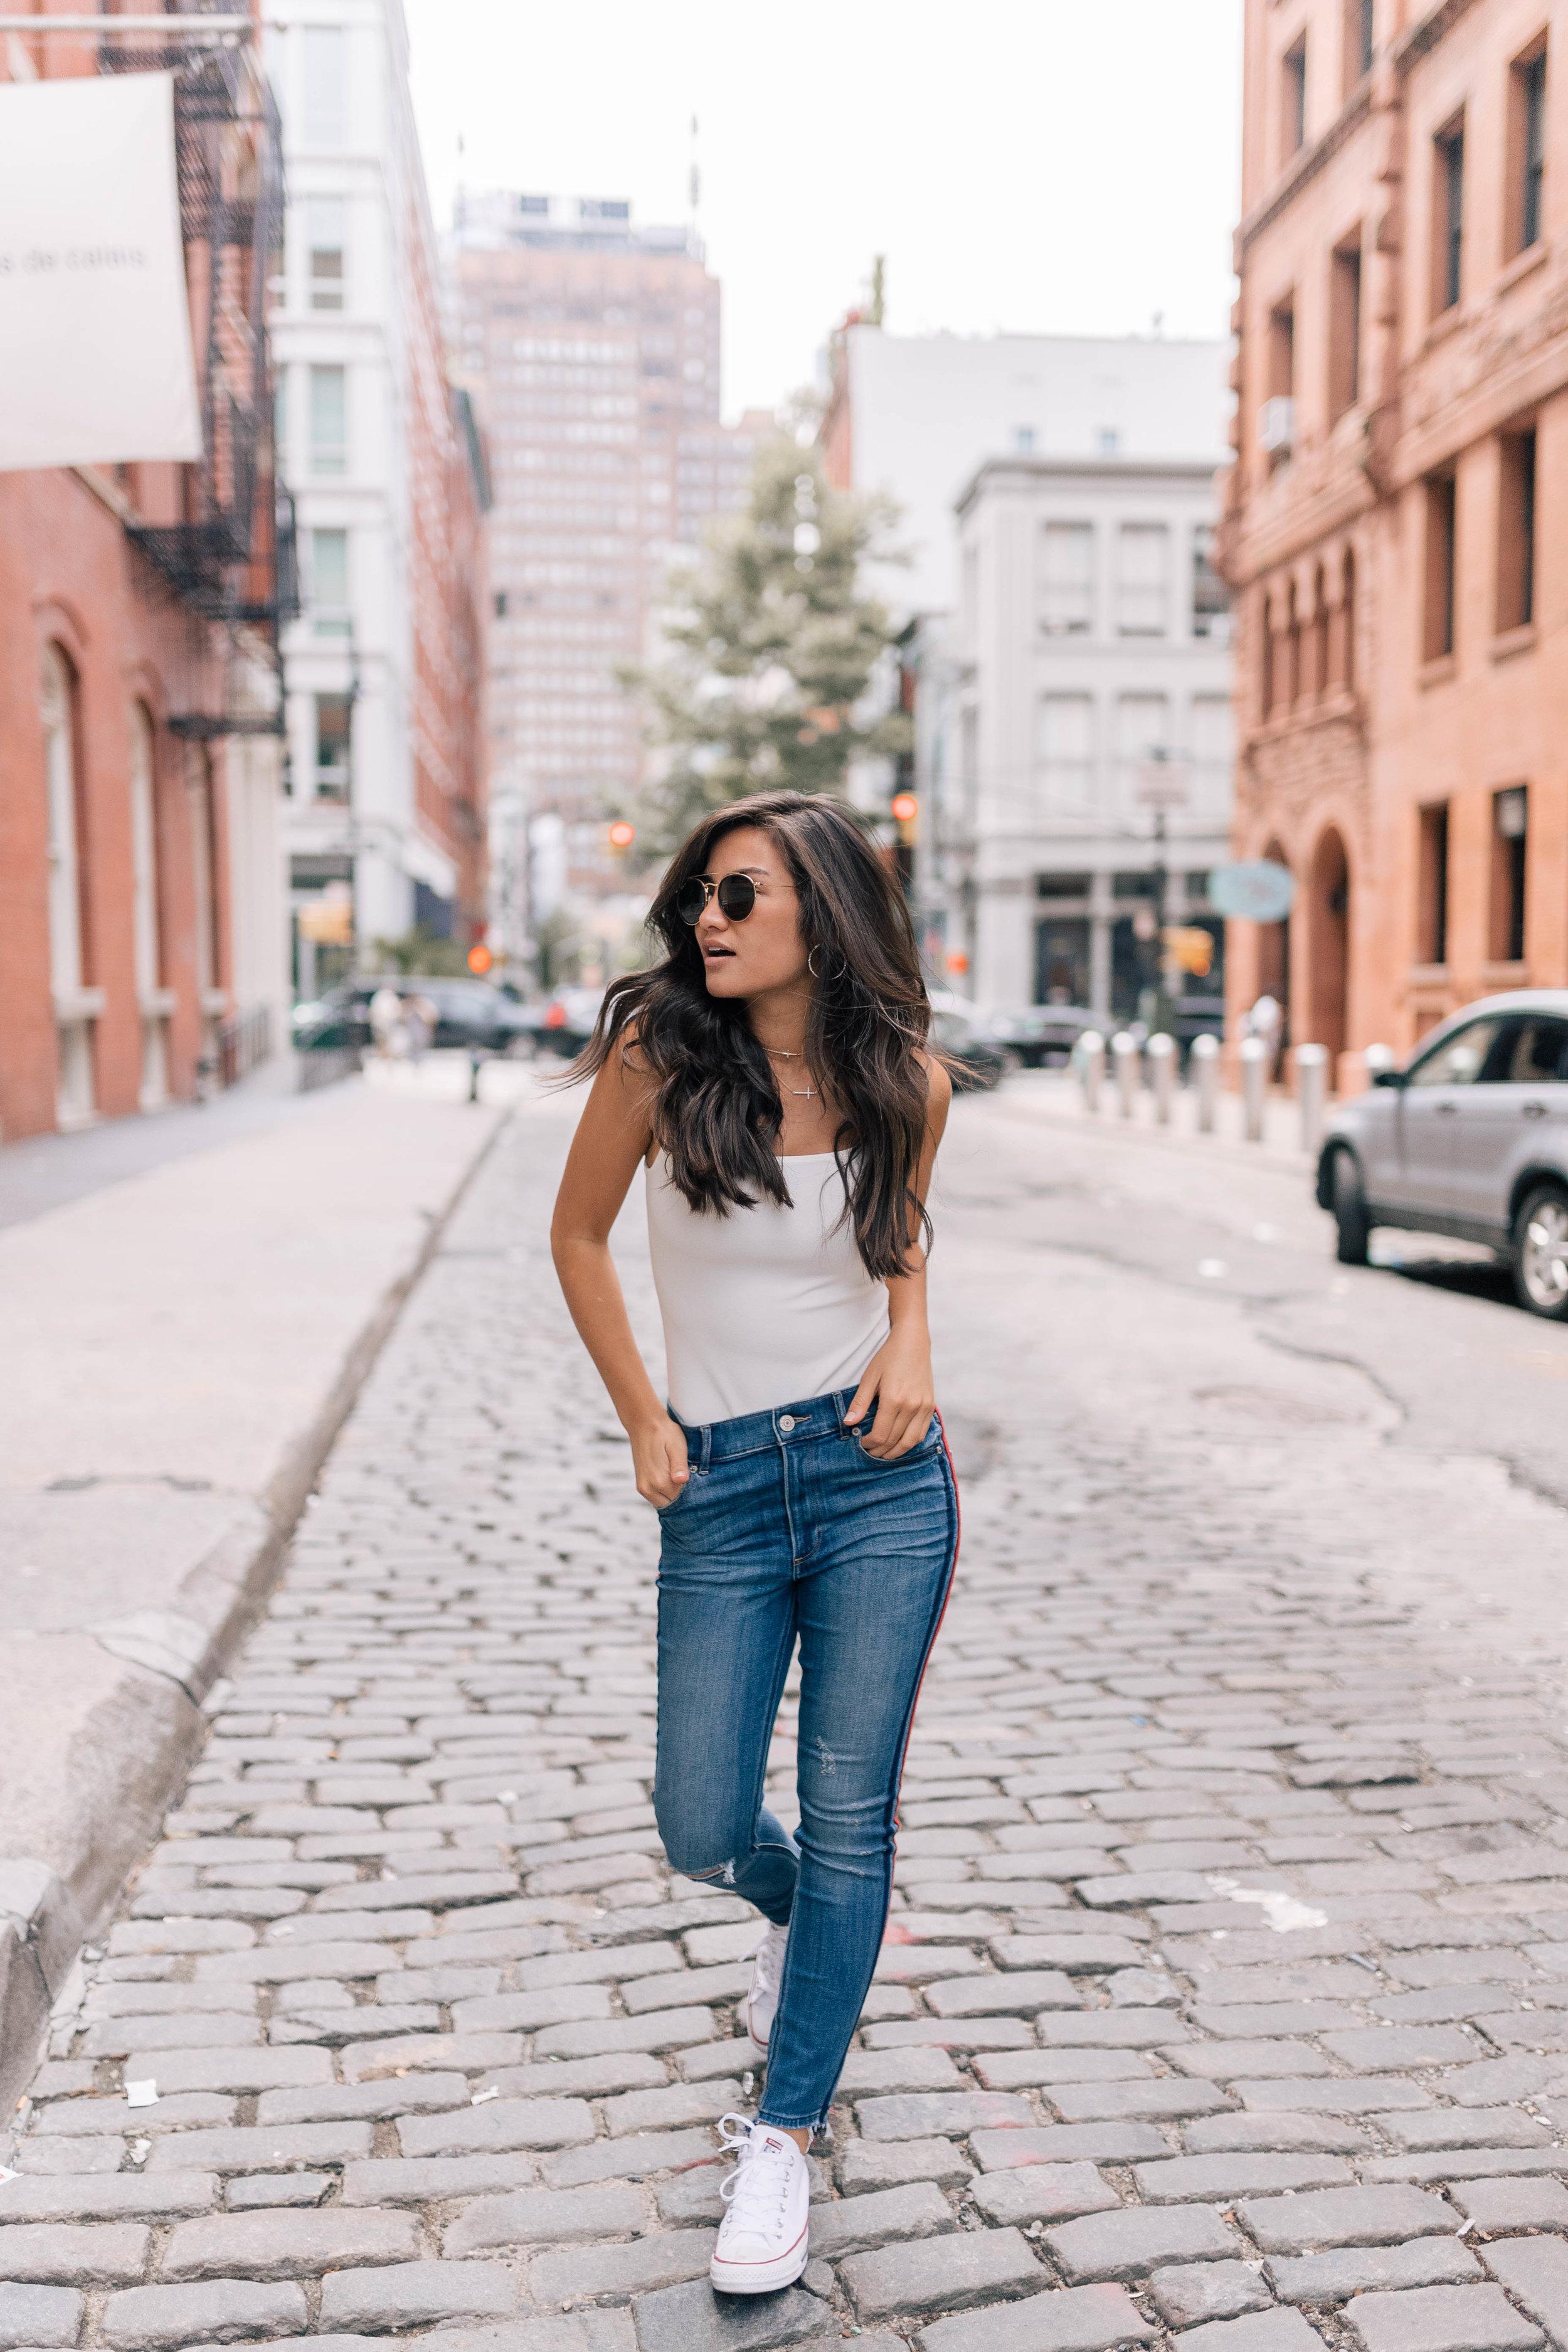 Caila Quinn & Nick Burrello Express Jeans